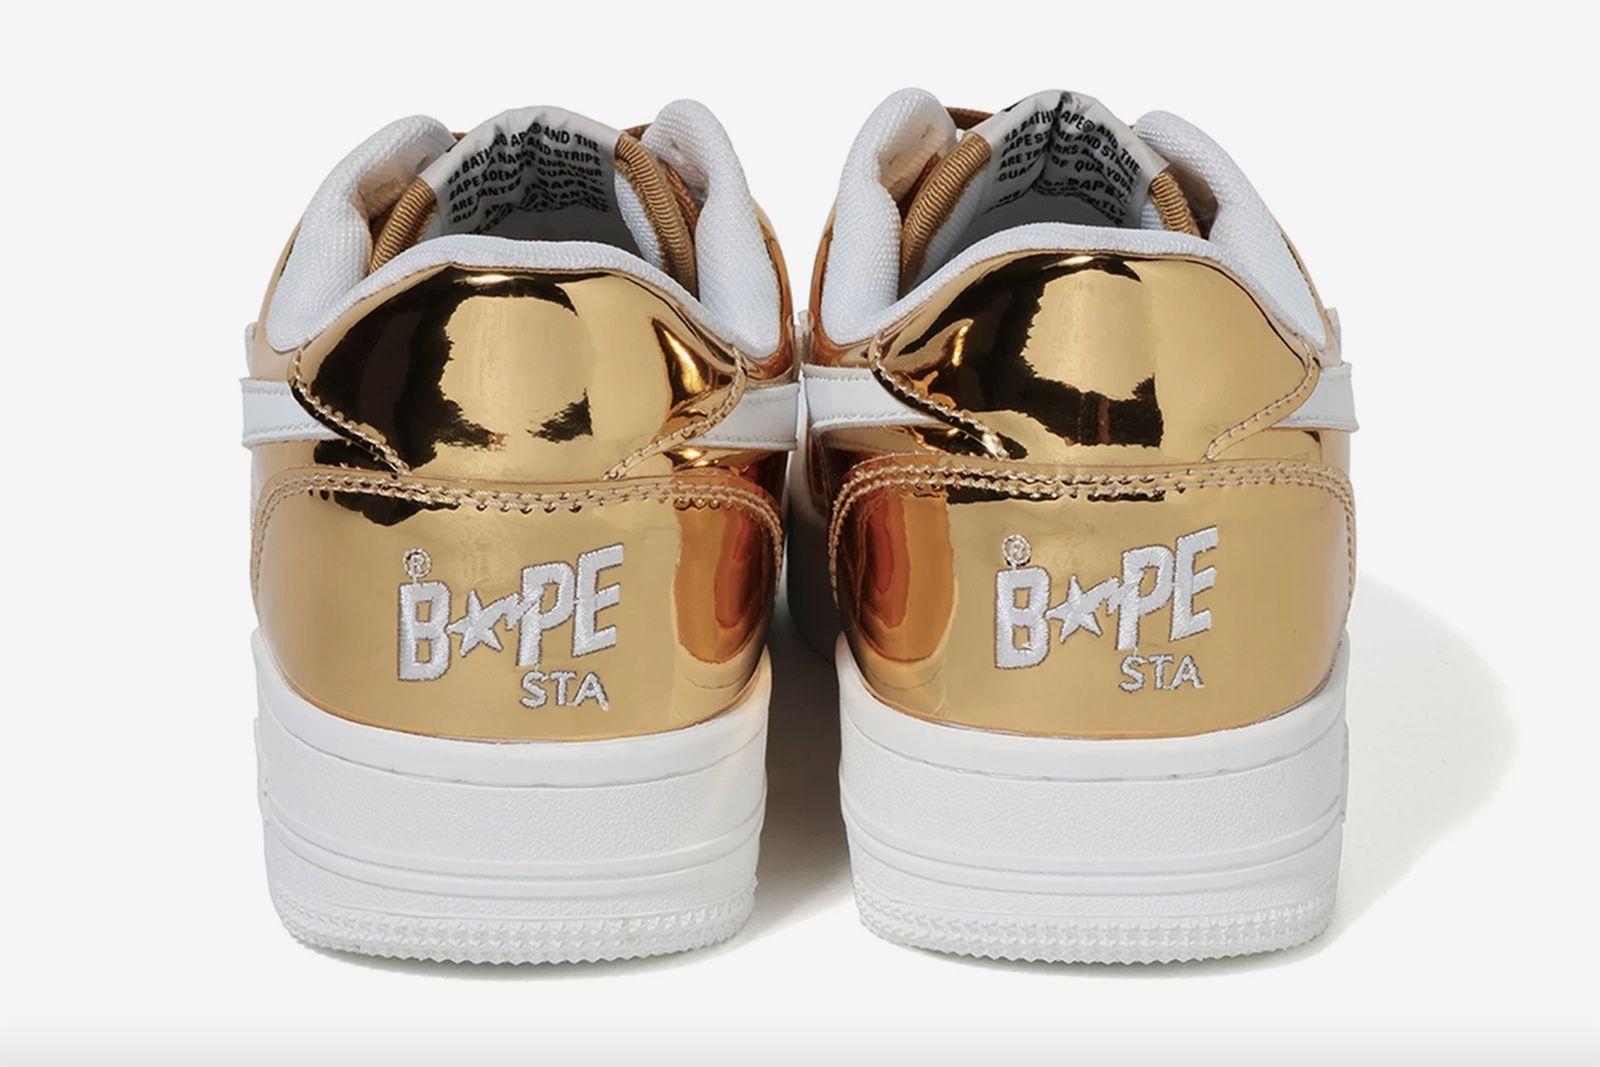 bape bapesta foil gold silver release date price A Bathing Ape